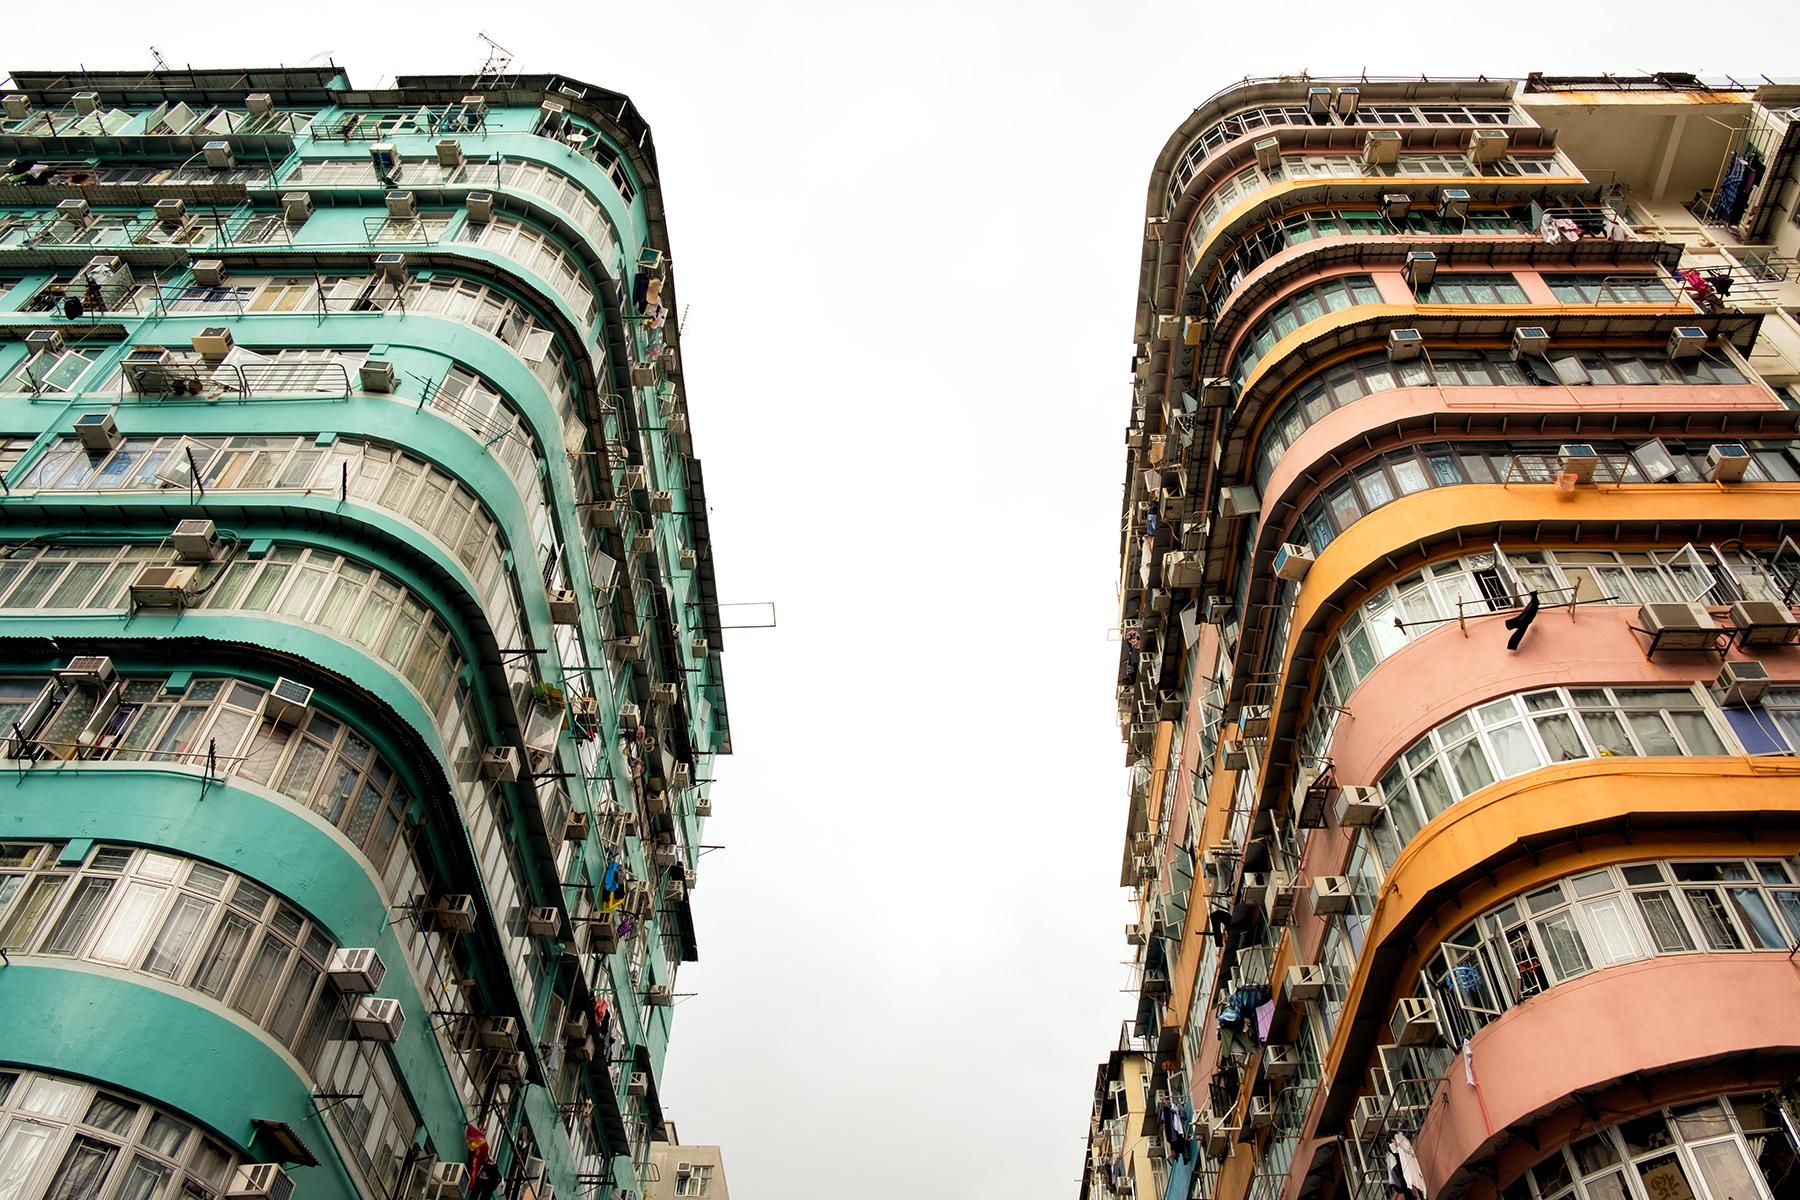 Doug_Caplan_Hong-Kong-Brutal-Compressions_Untitled_03.jpg